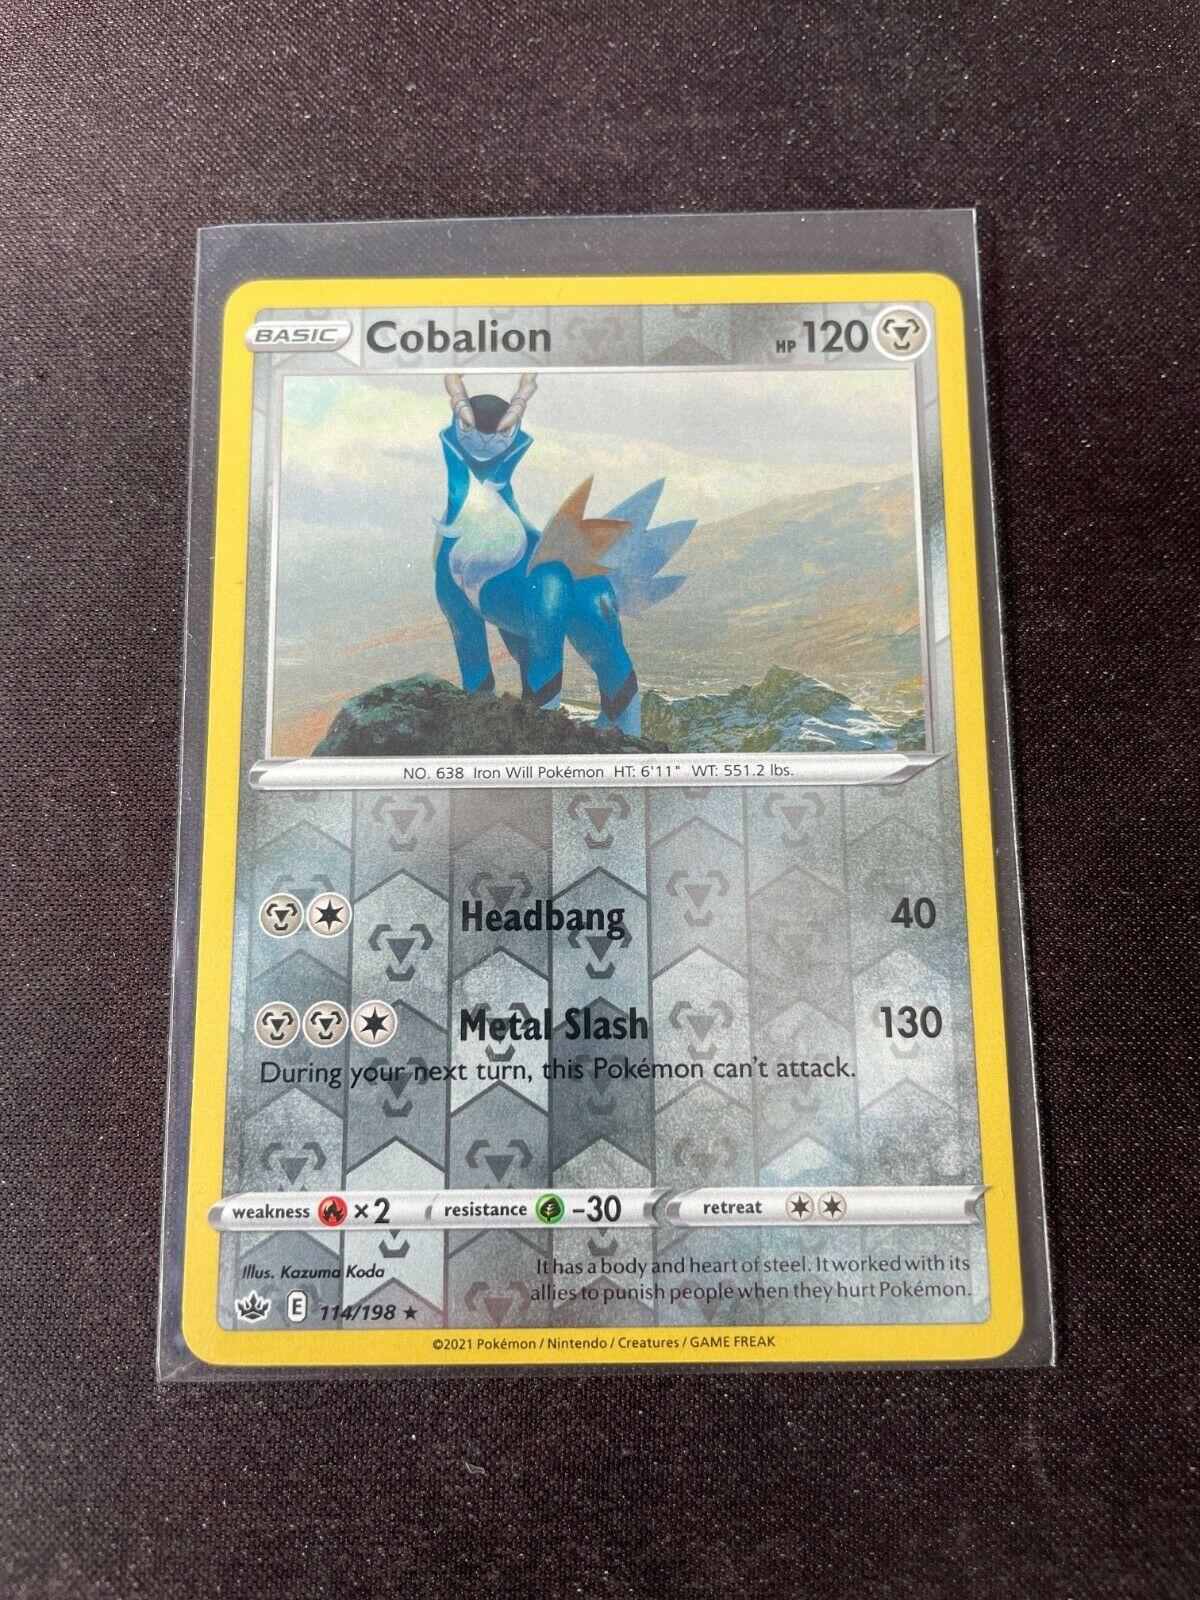 Pokemon TCG Chilling Reign 114/198 Cobalion Card Fresh Reverse Holo Mint Rare